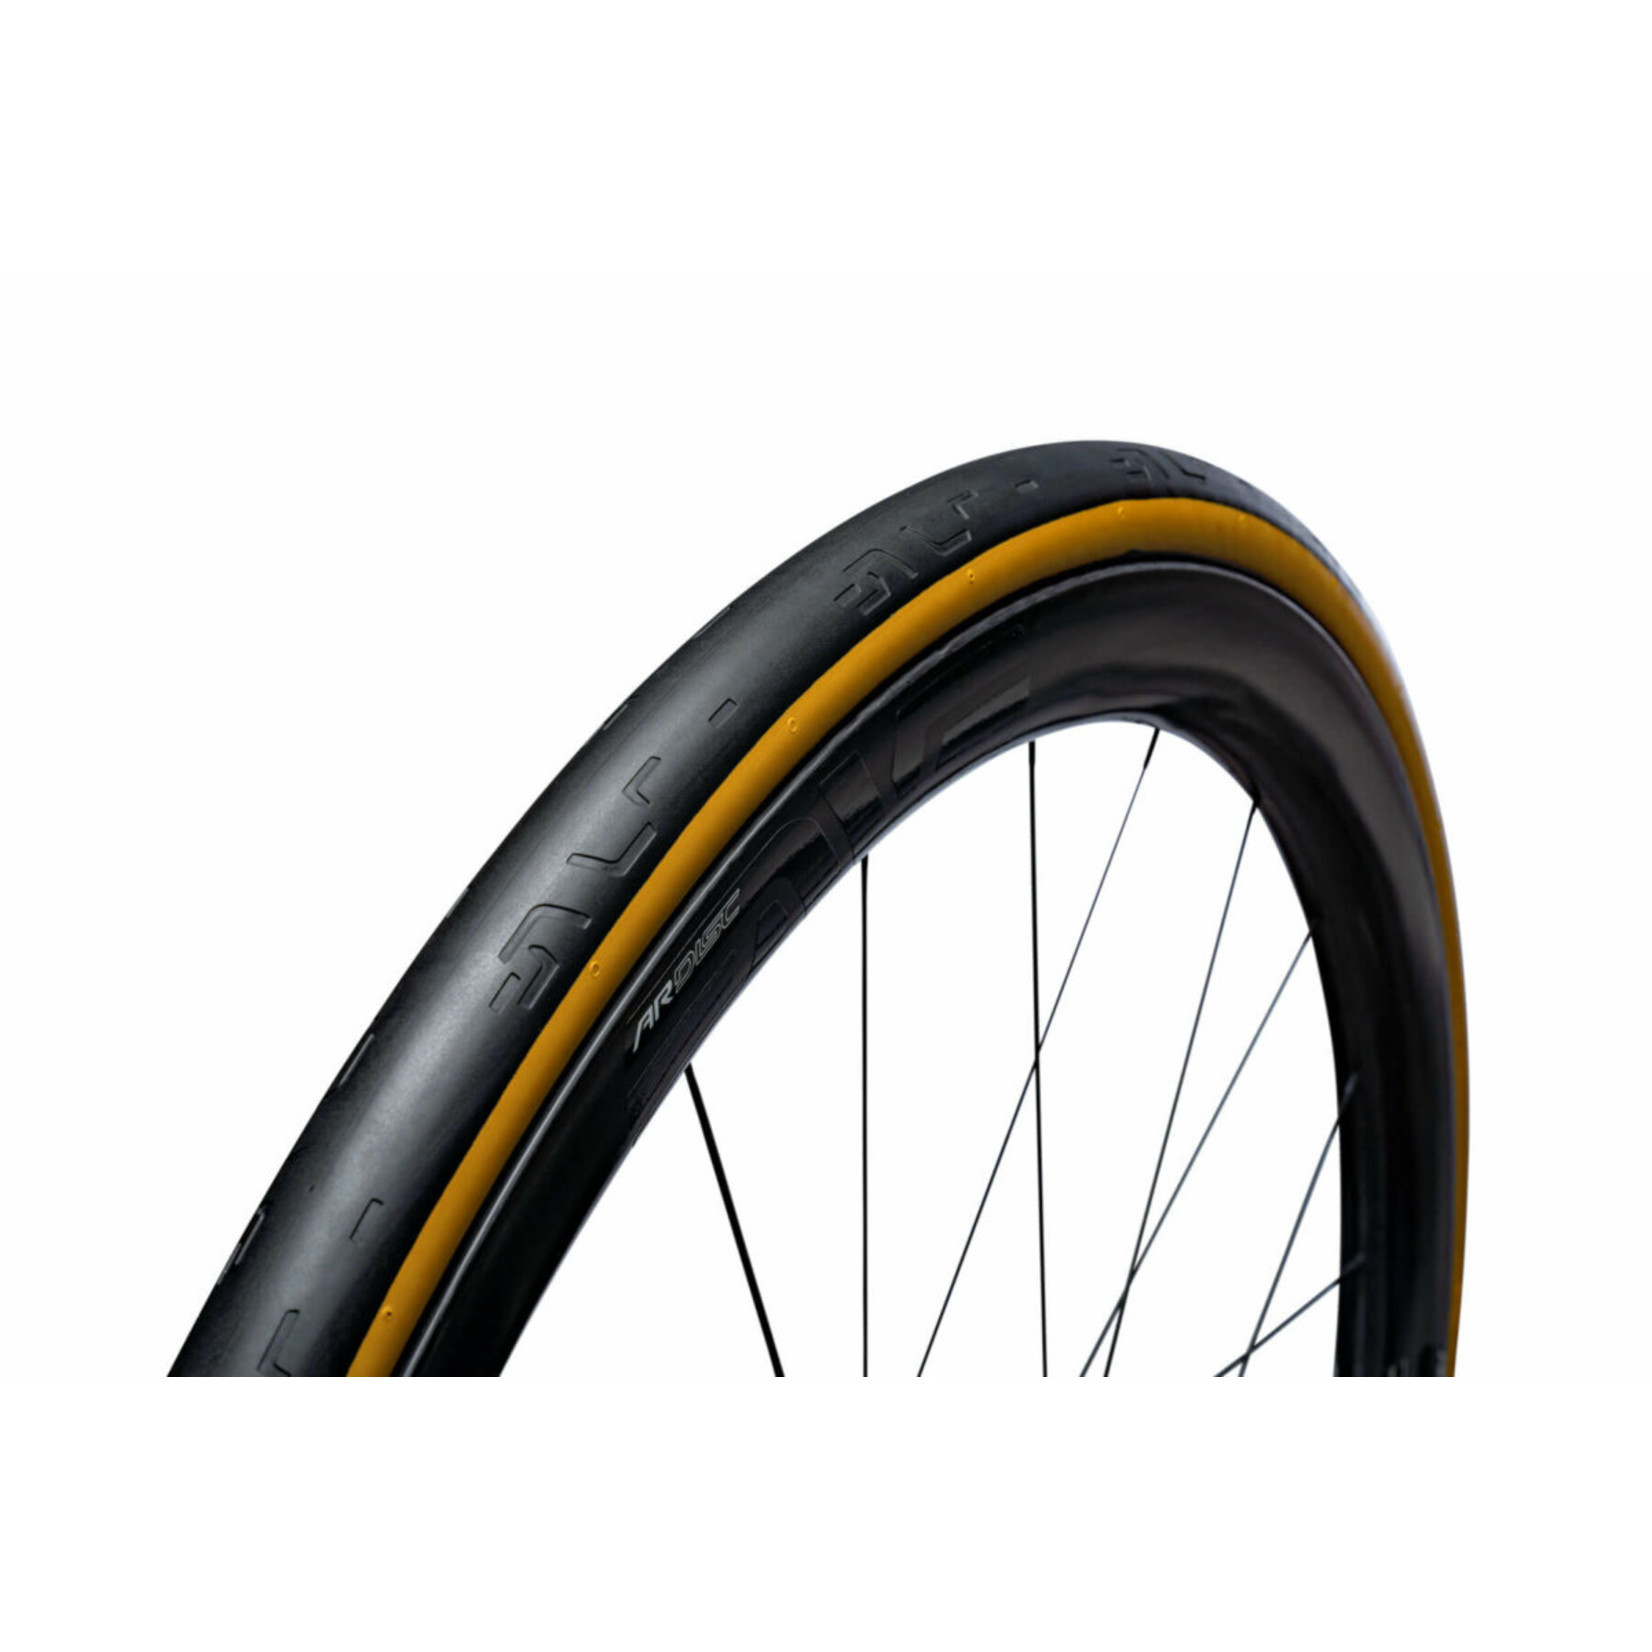 ENVE ENVE SES Road Tire 700x29mm Tubeless Ready Tan Sidewall